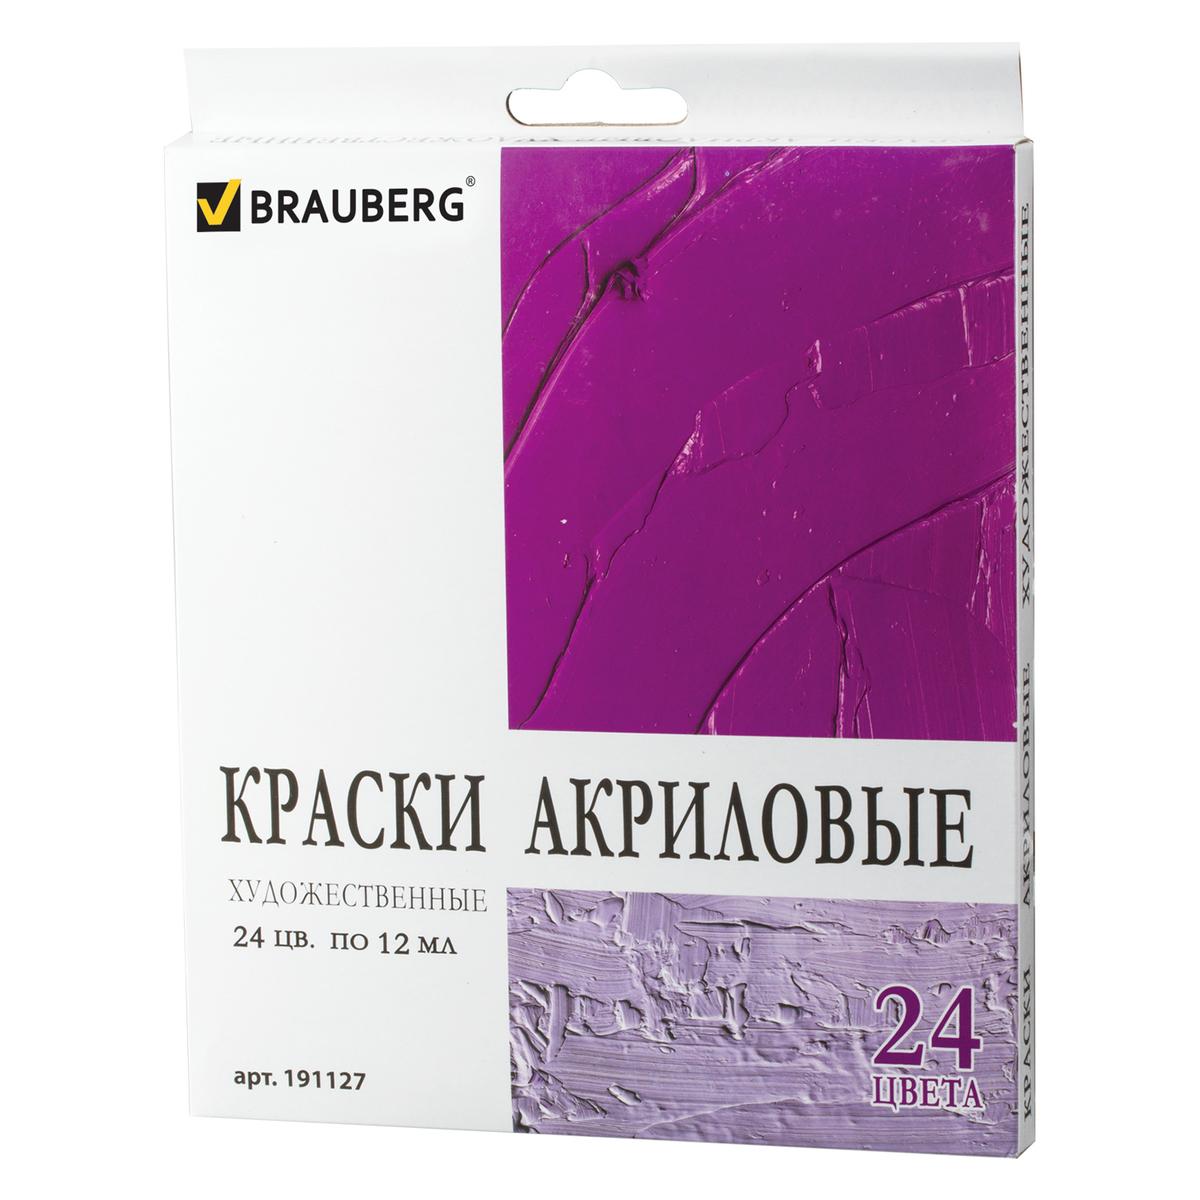 Brauberg Краски акриловые 24 цвета 191127 колор толкушка зеленая